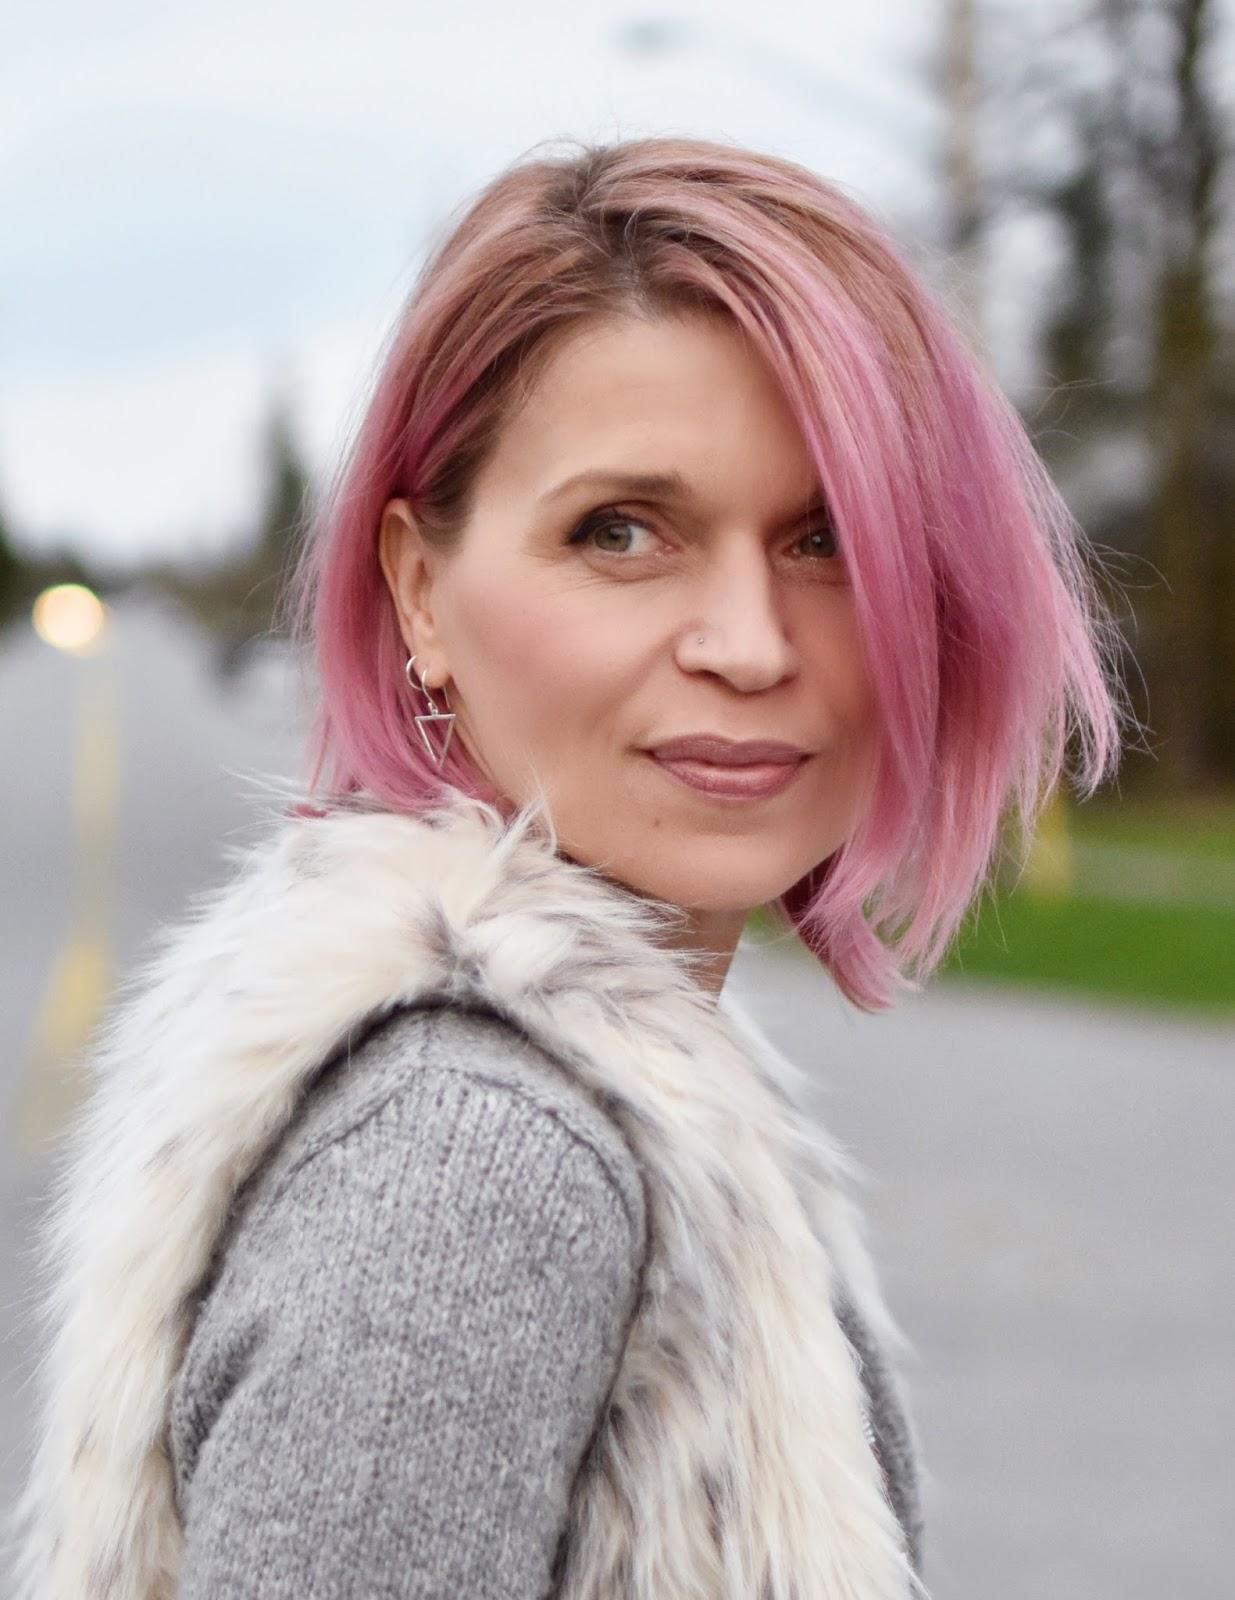 Monika Faulkner outfit inspiration - faux-fur vest, pink hair